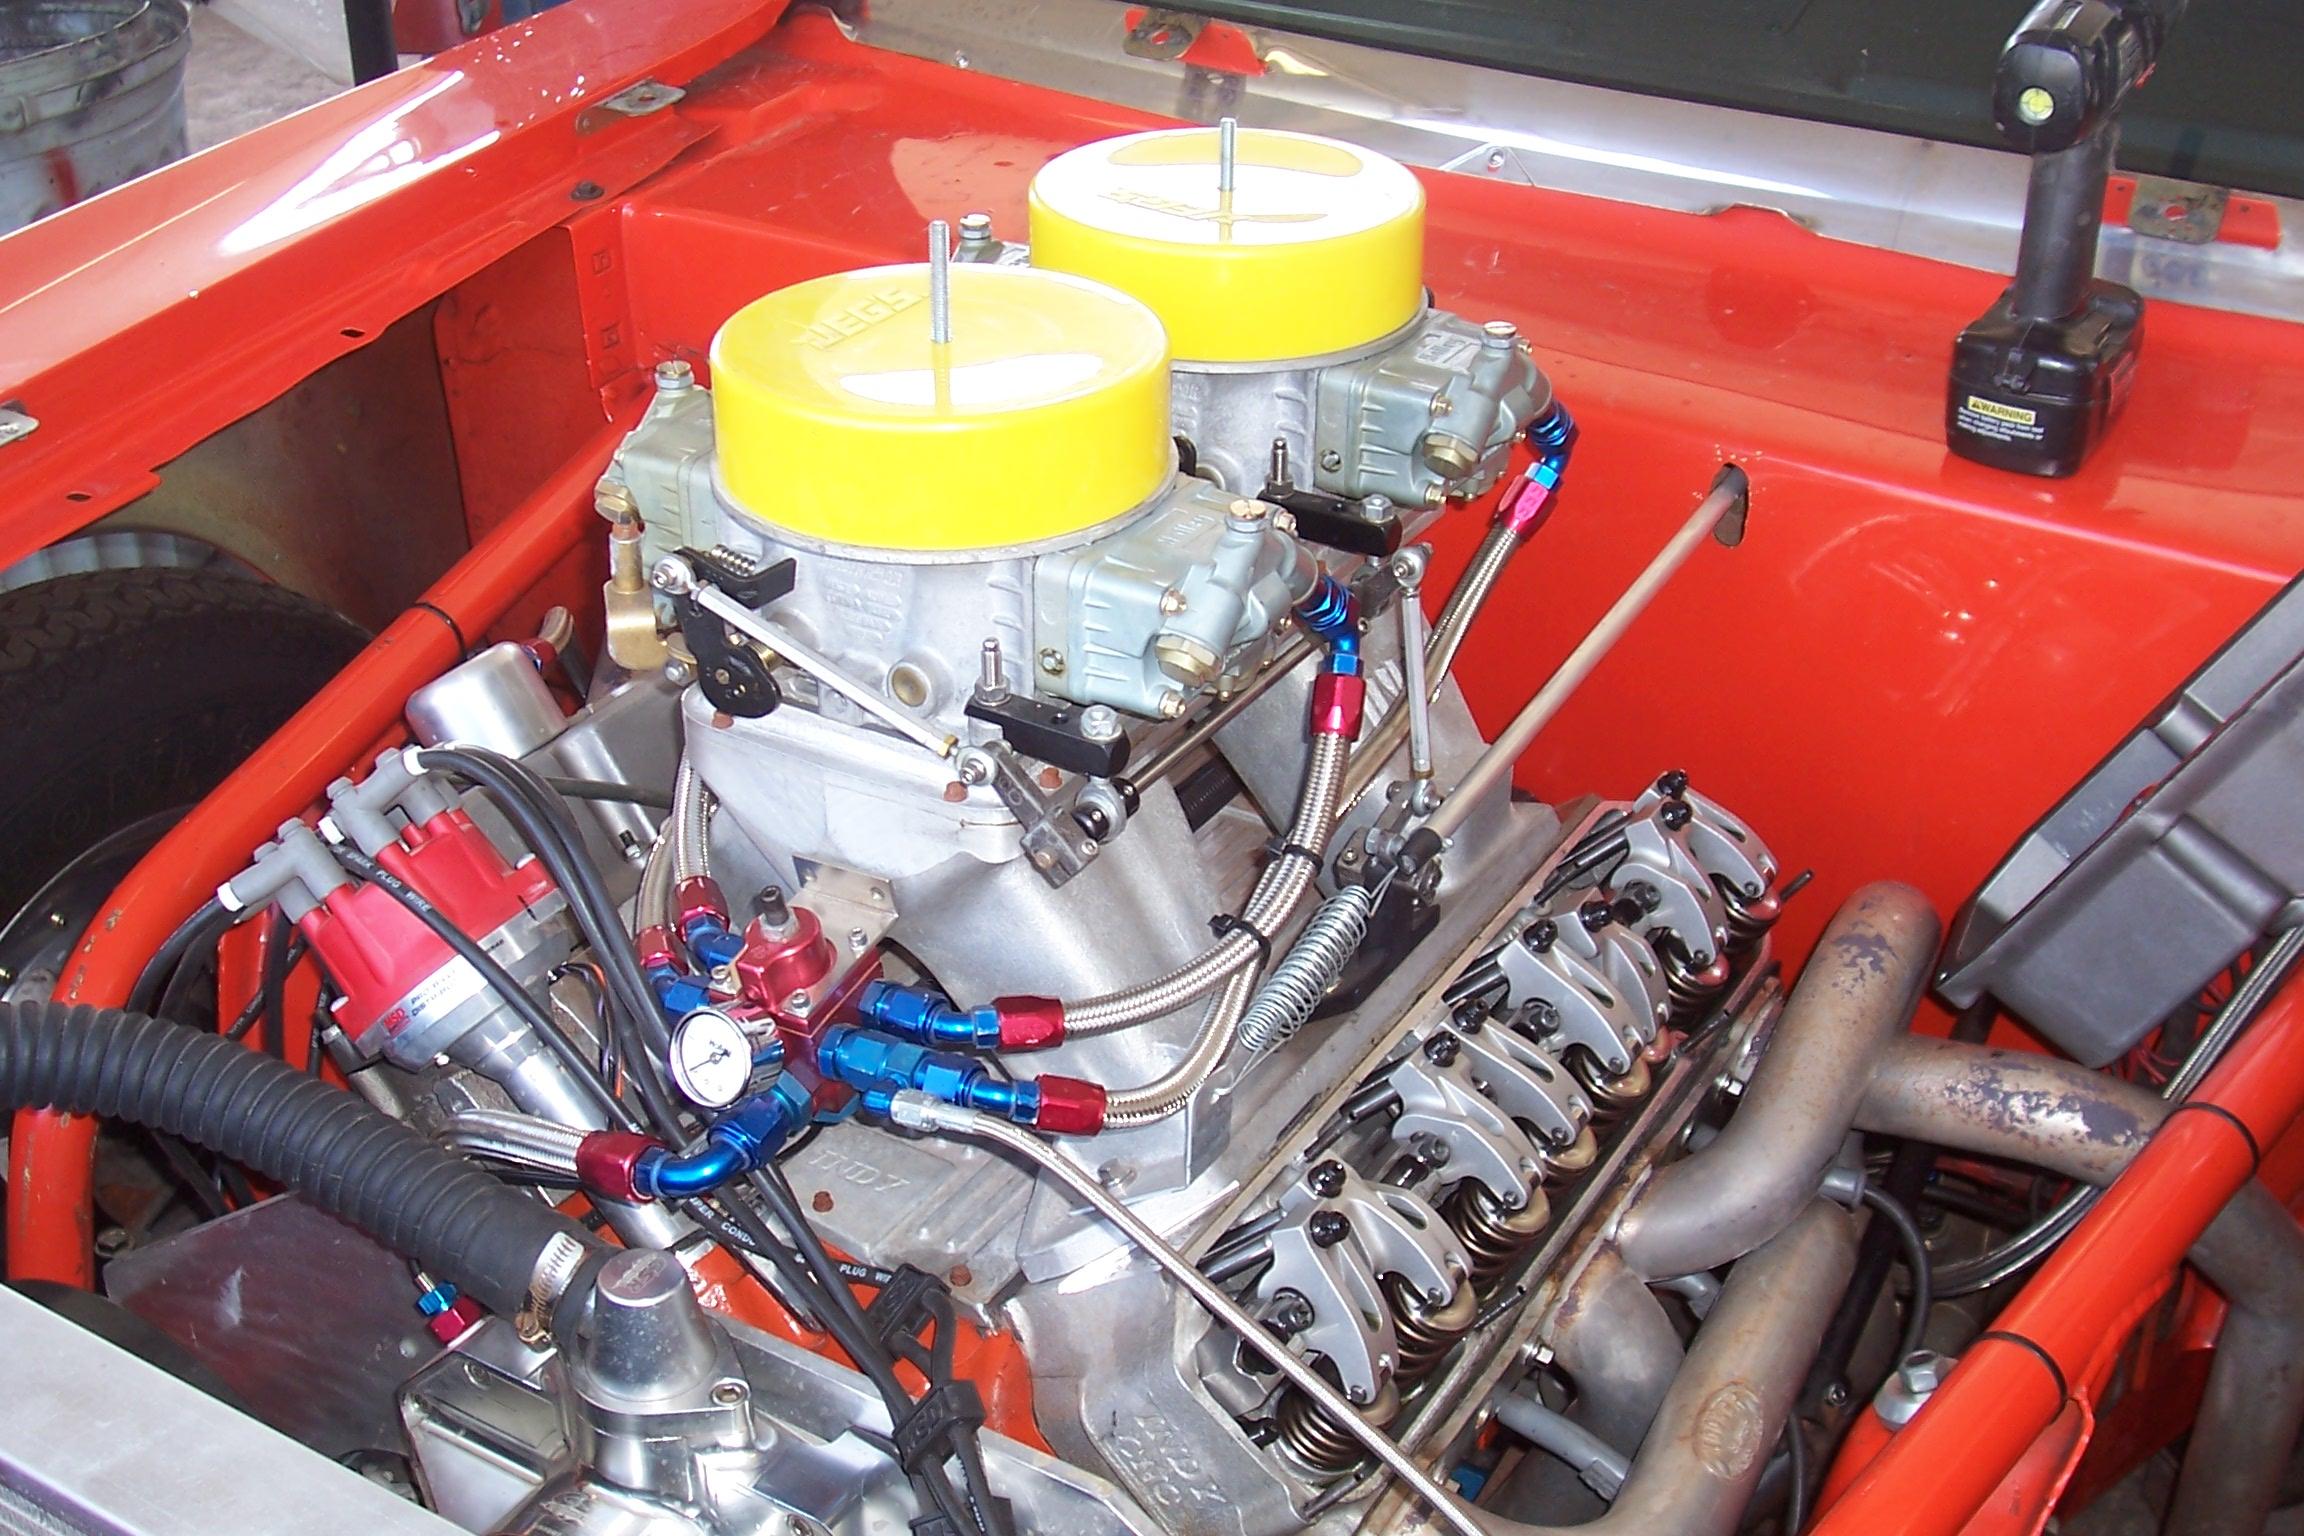 Tunnelram Unlawfl S Race Amp Engine Tech Moparts Forums